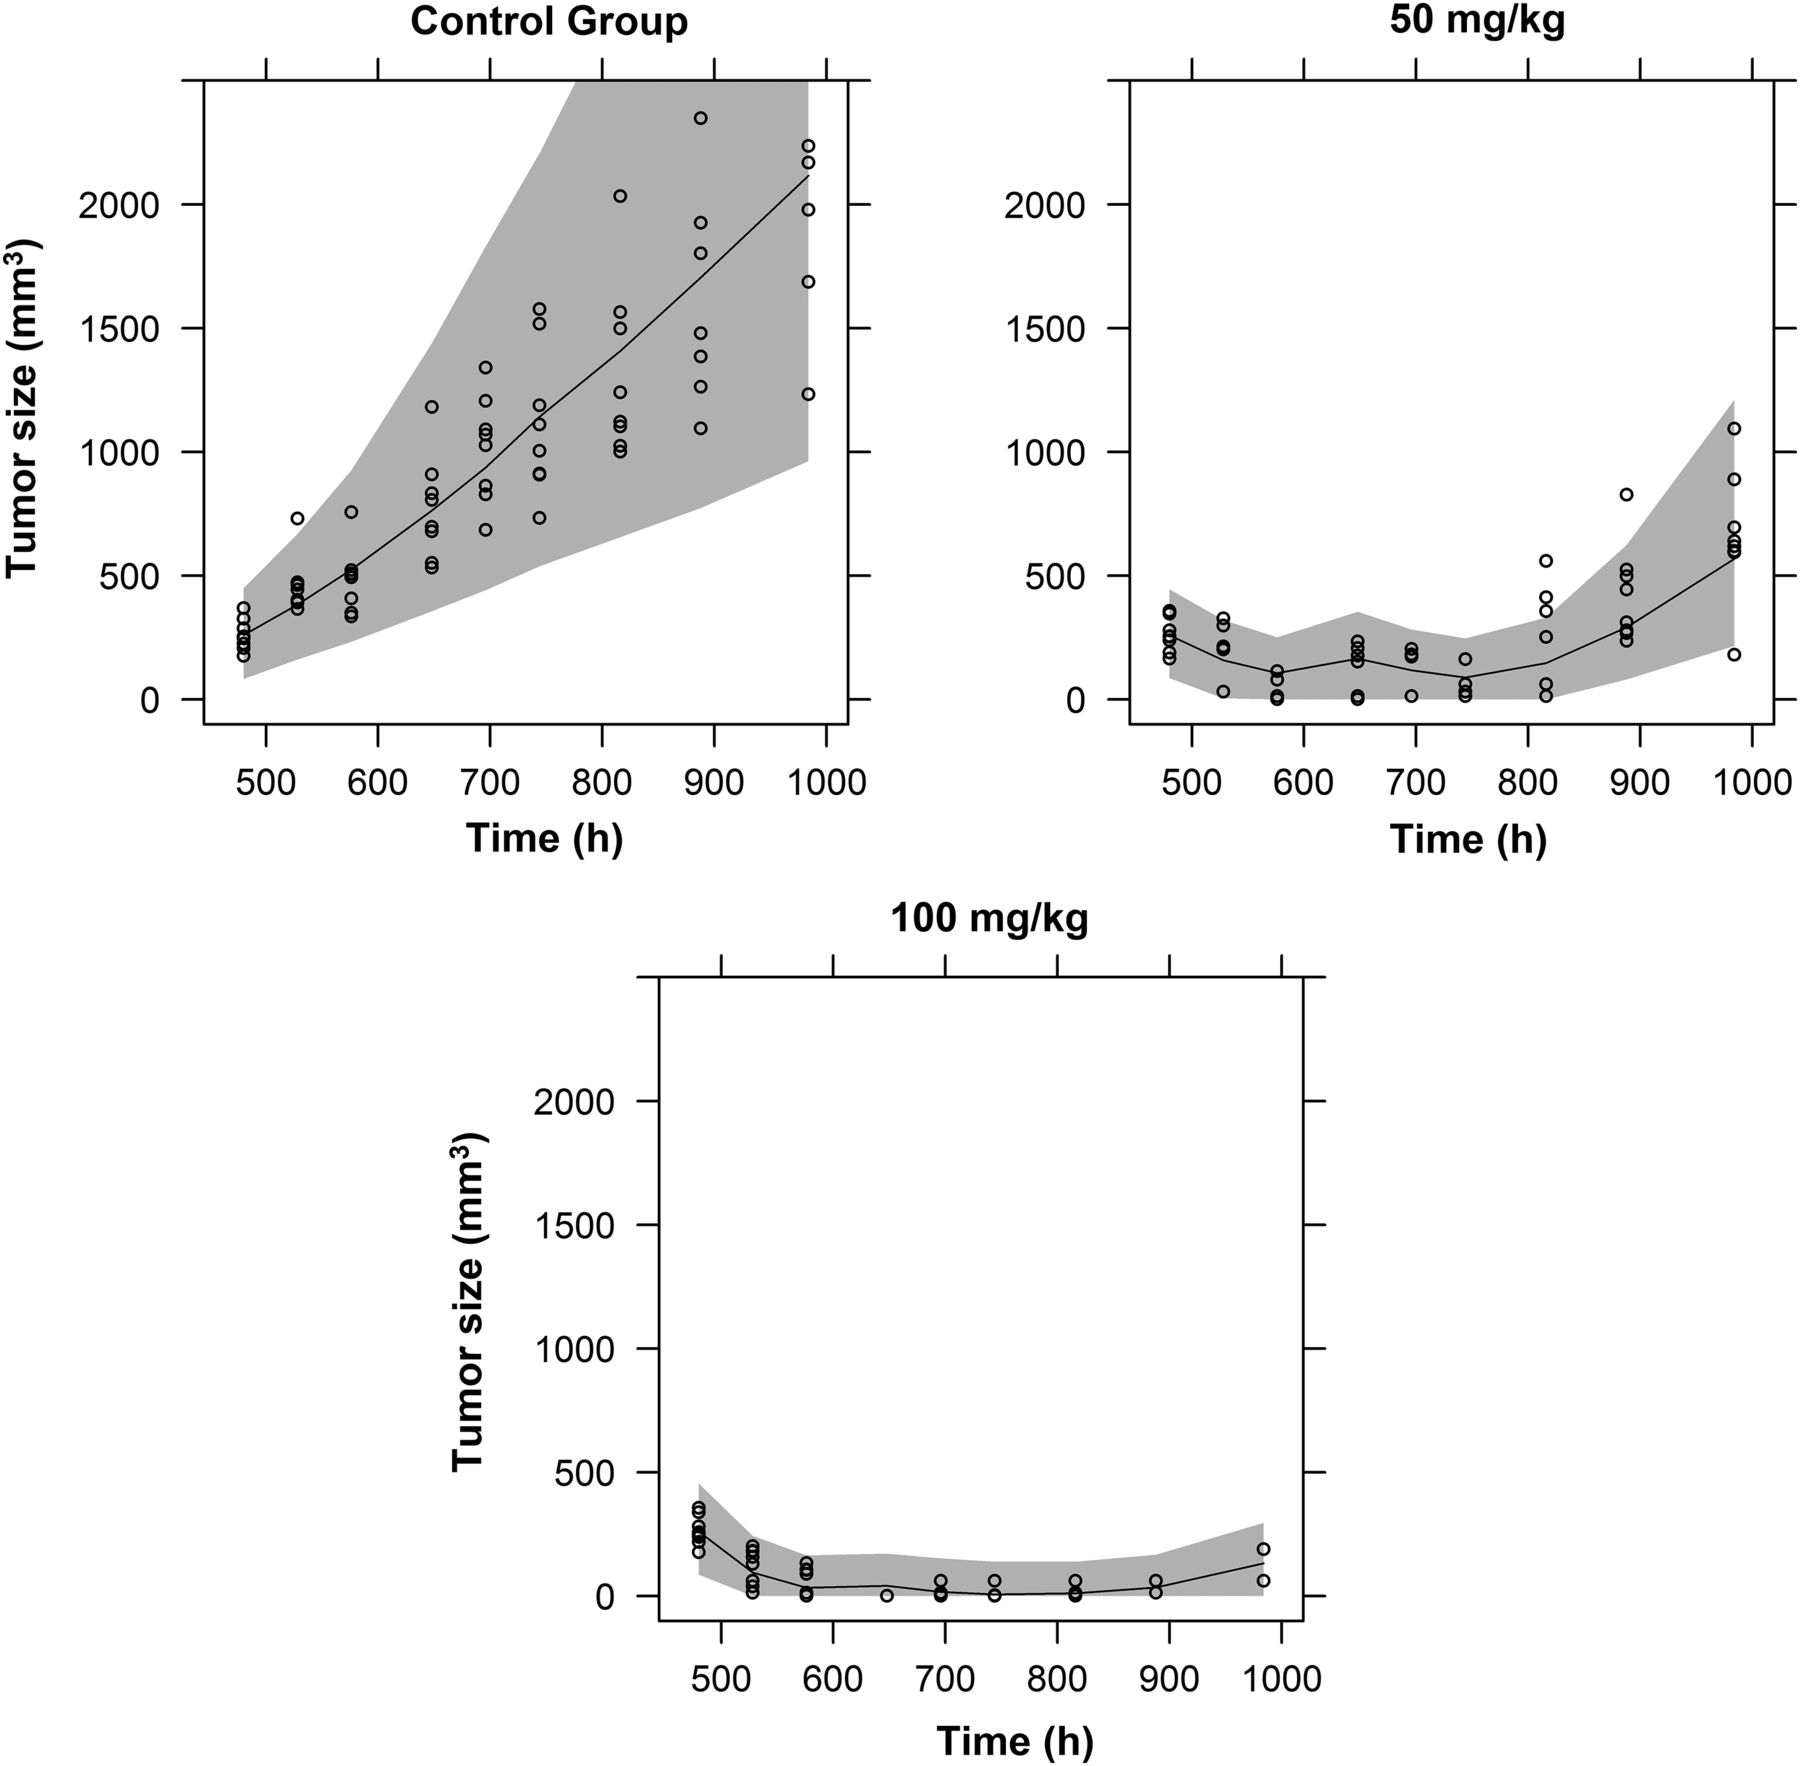 Tumor Growth Inhibition Modelling Based on Receptor